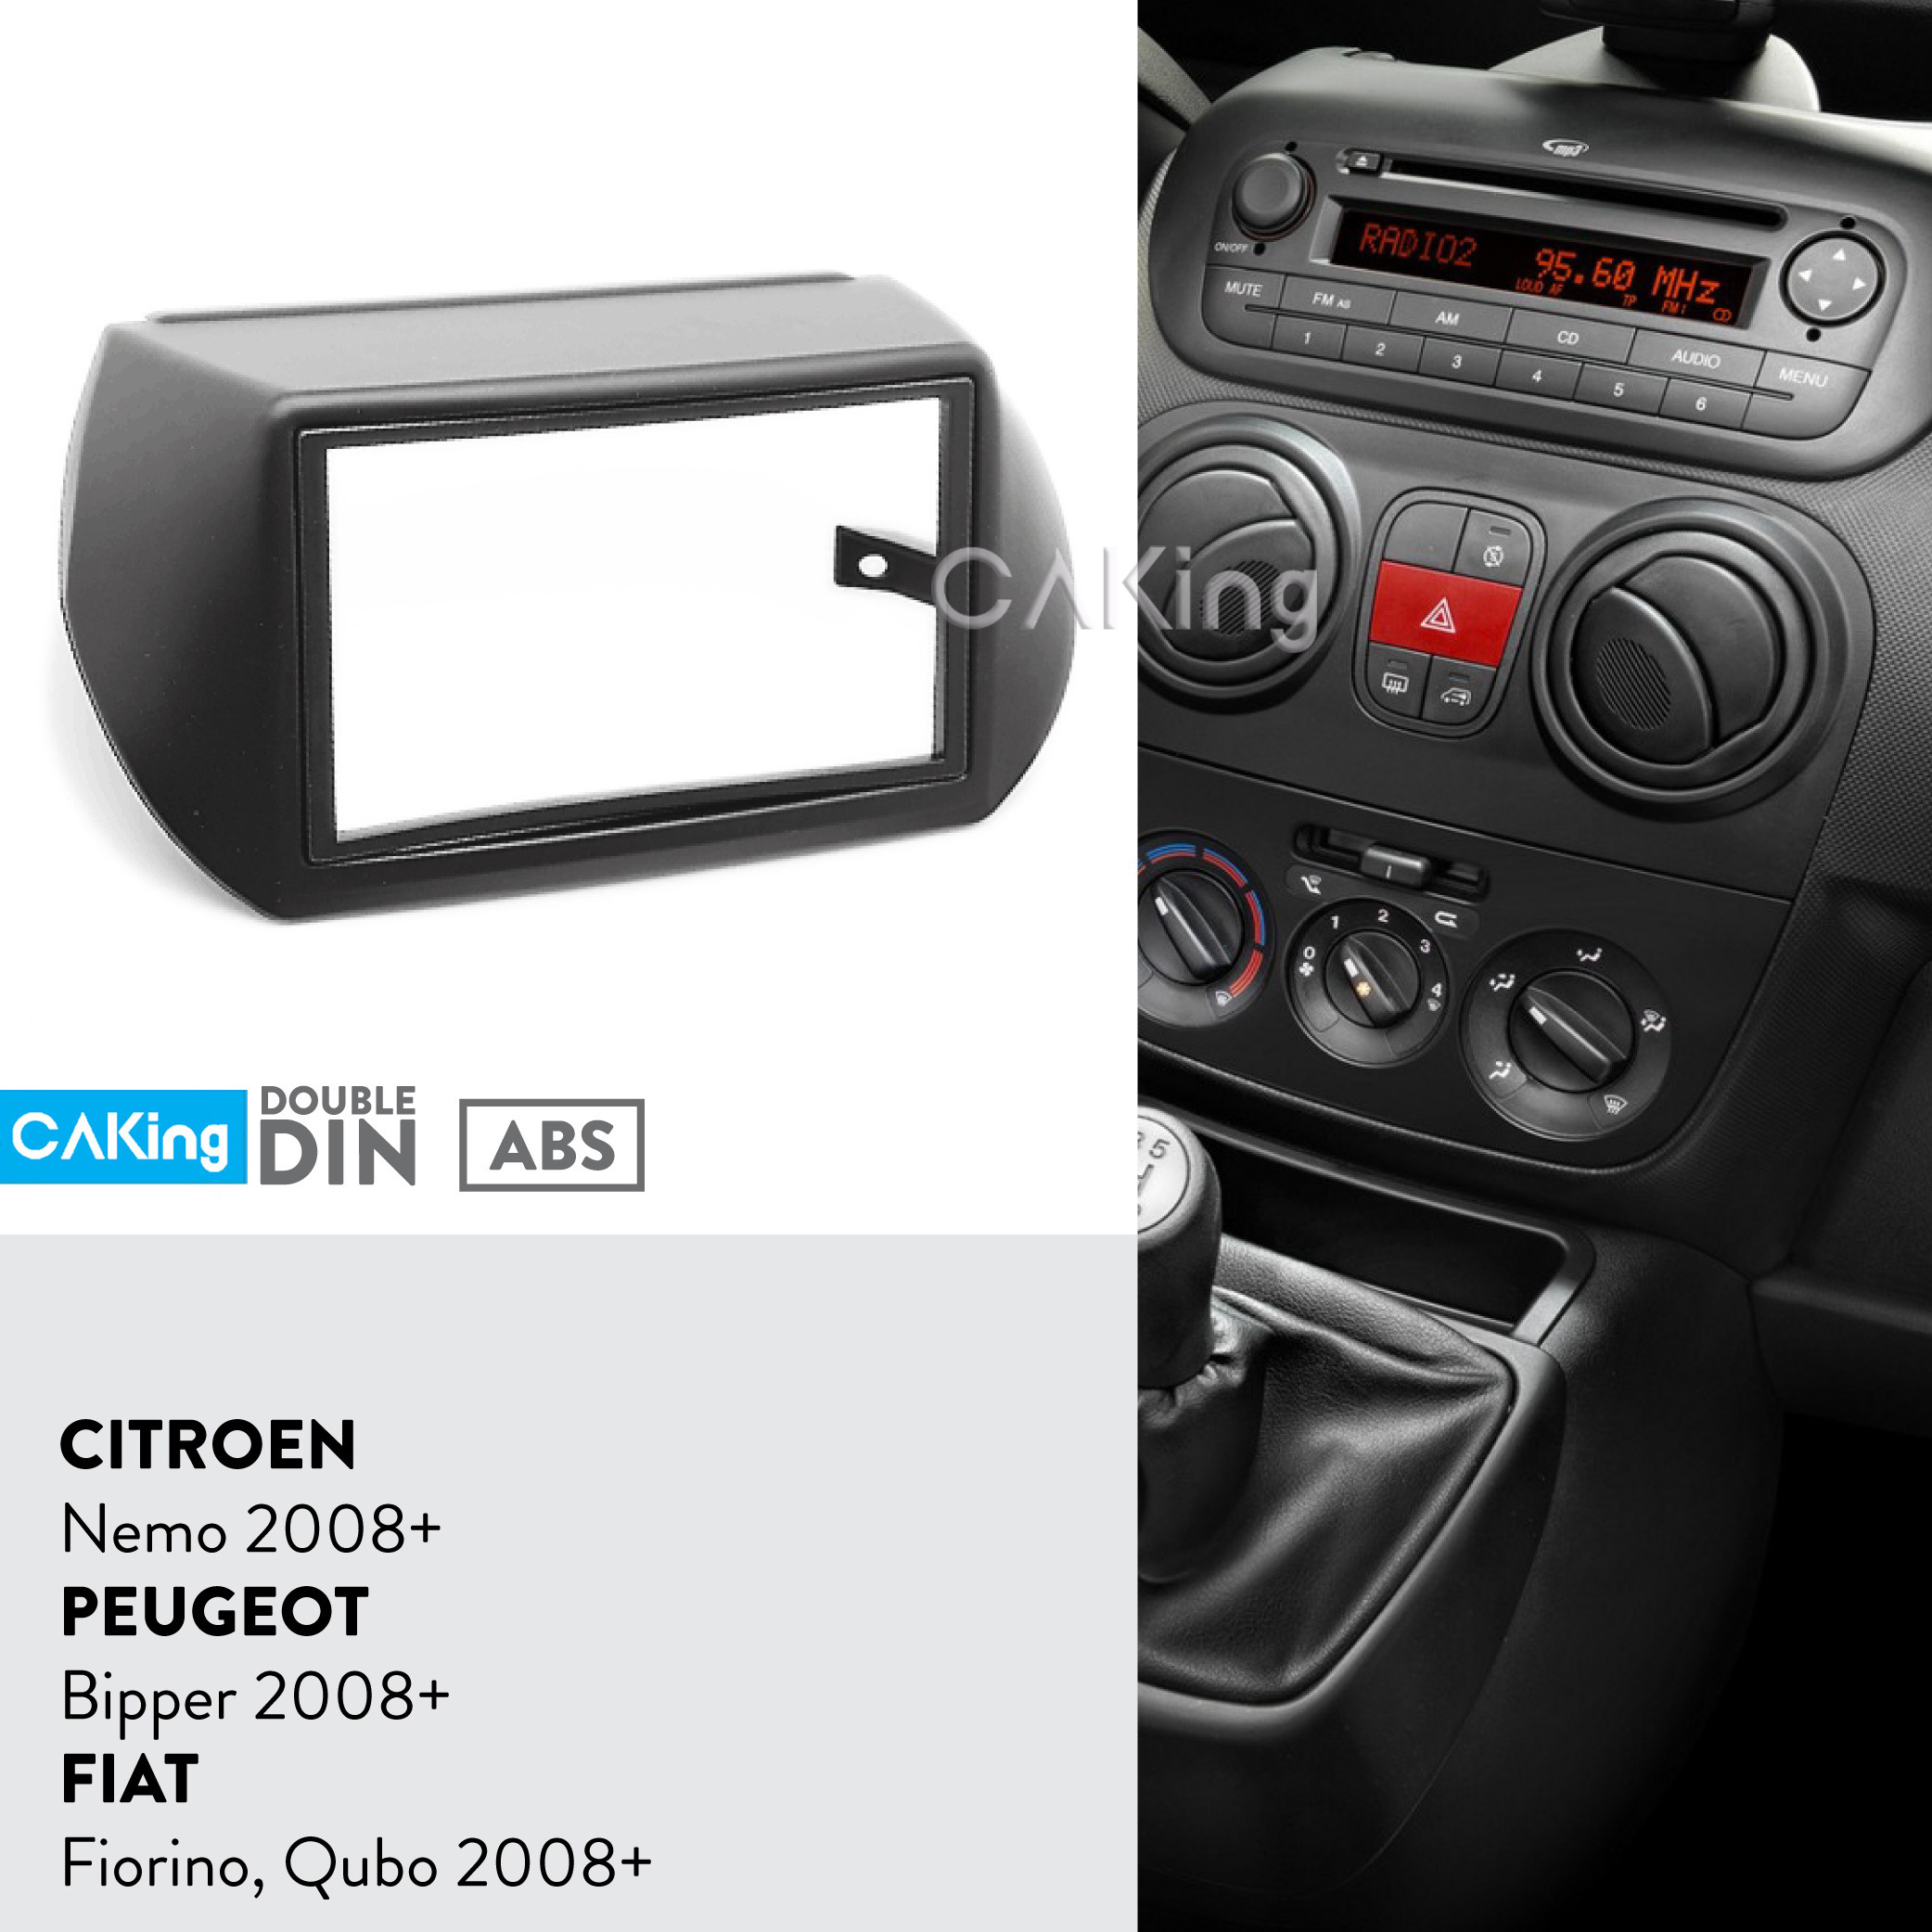 Double Din Car Fascia Radio Panel for CITROEN Nemo / PEUGEOT Bipper / FIAT Fiorino, Qubo 2008+ Dash Kit Adapter Facia Face Plate-in Fascias from Automobiles & Motorcycles    1